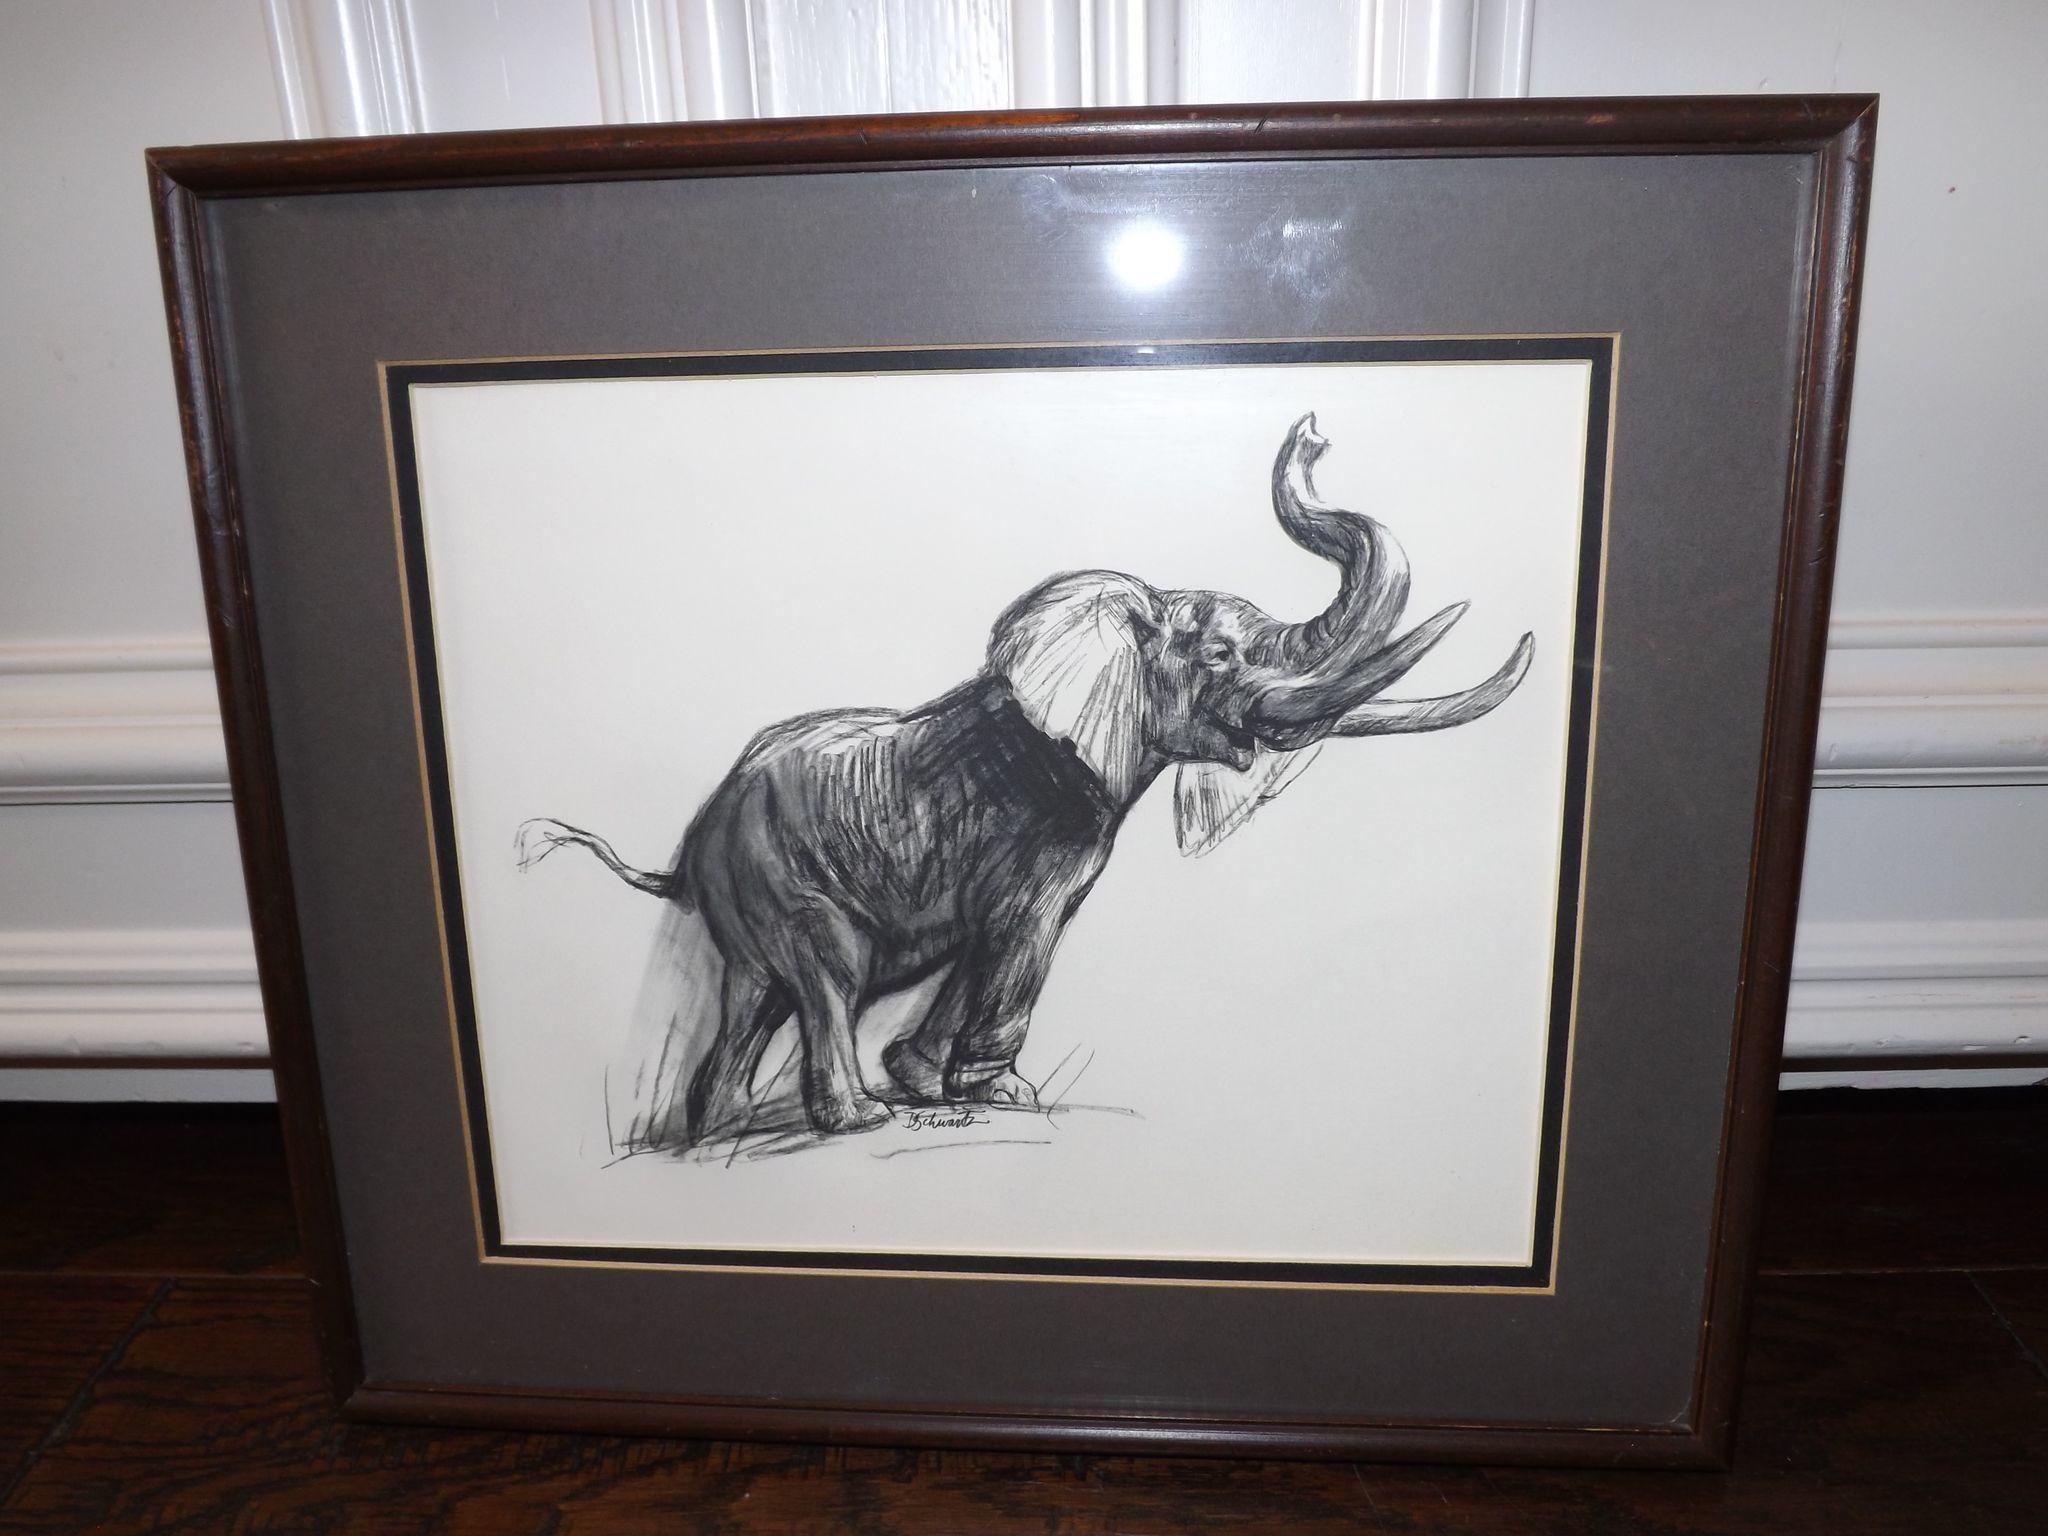 Vintage 1950's David Schwartz Photogravure Print - Elephant